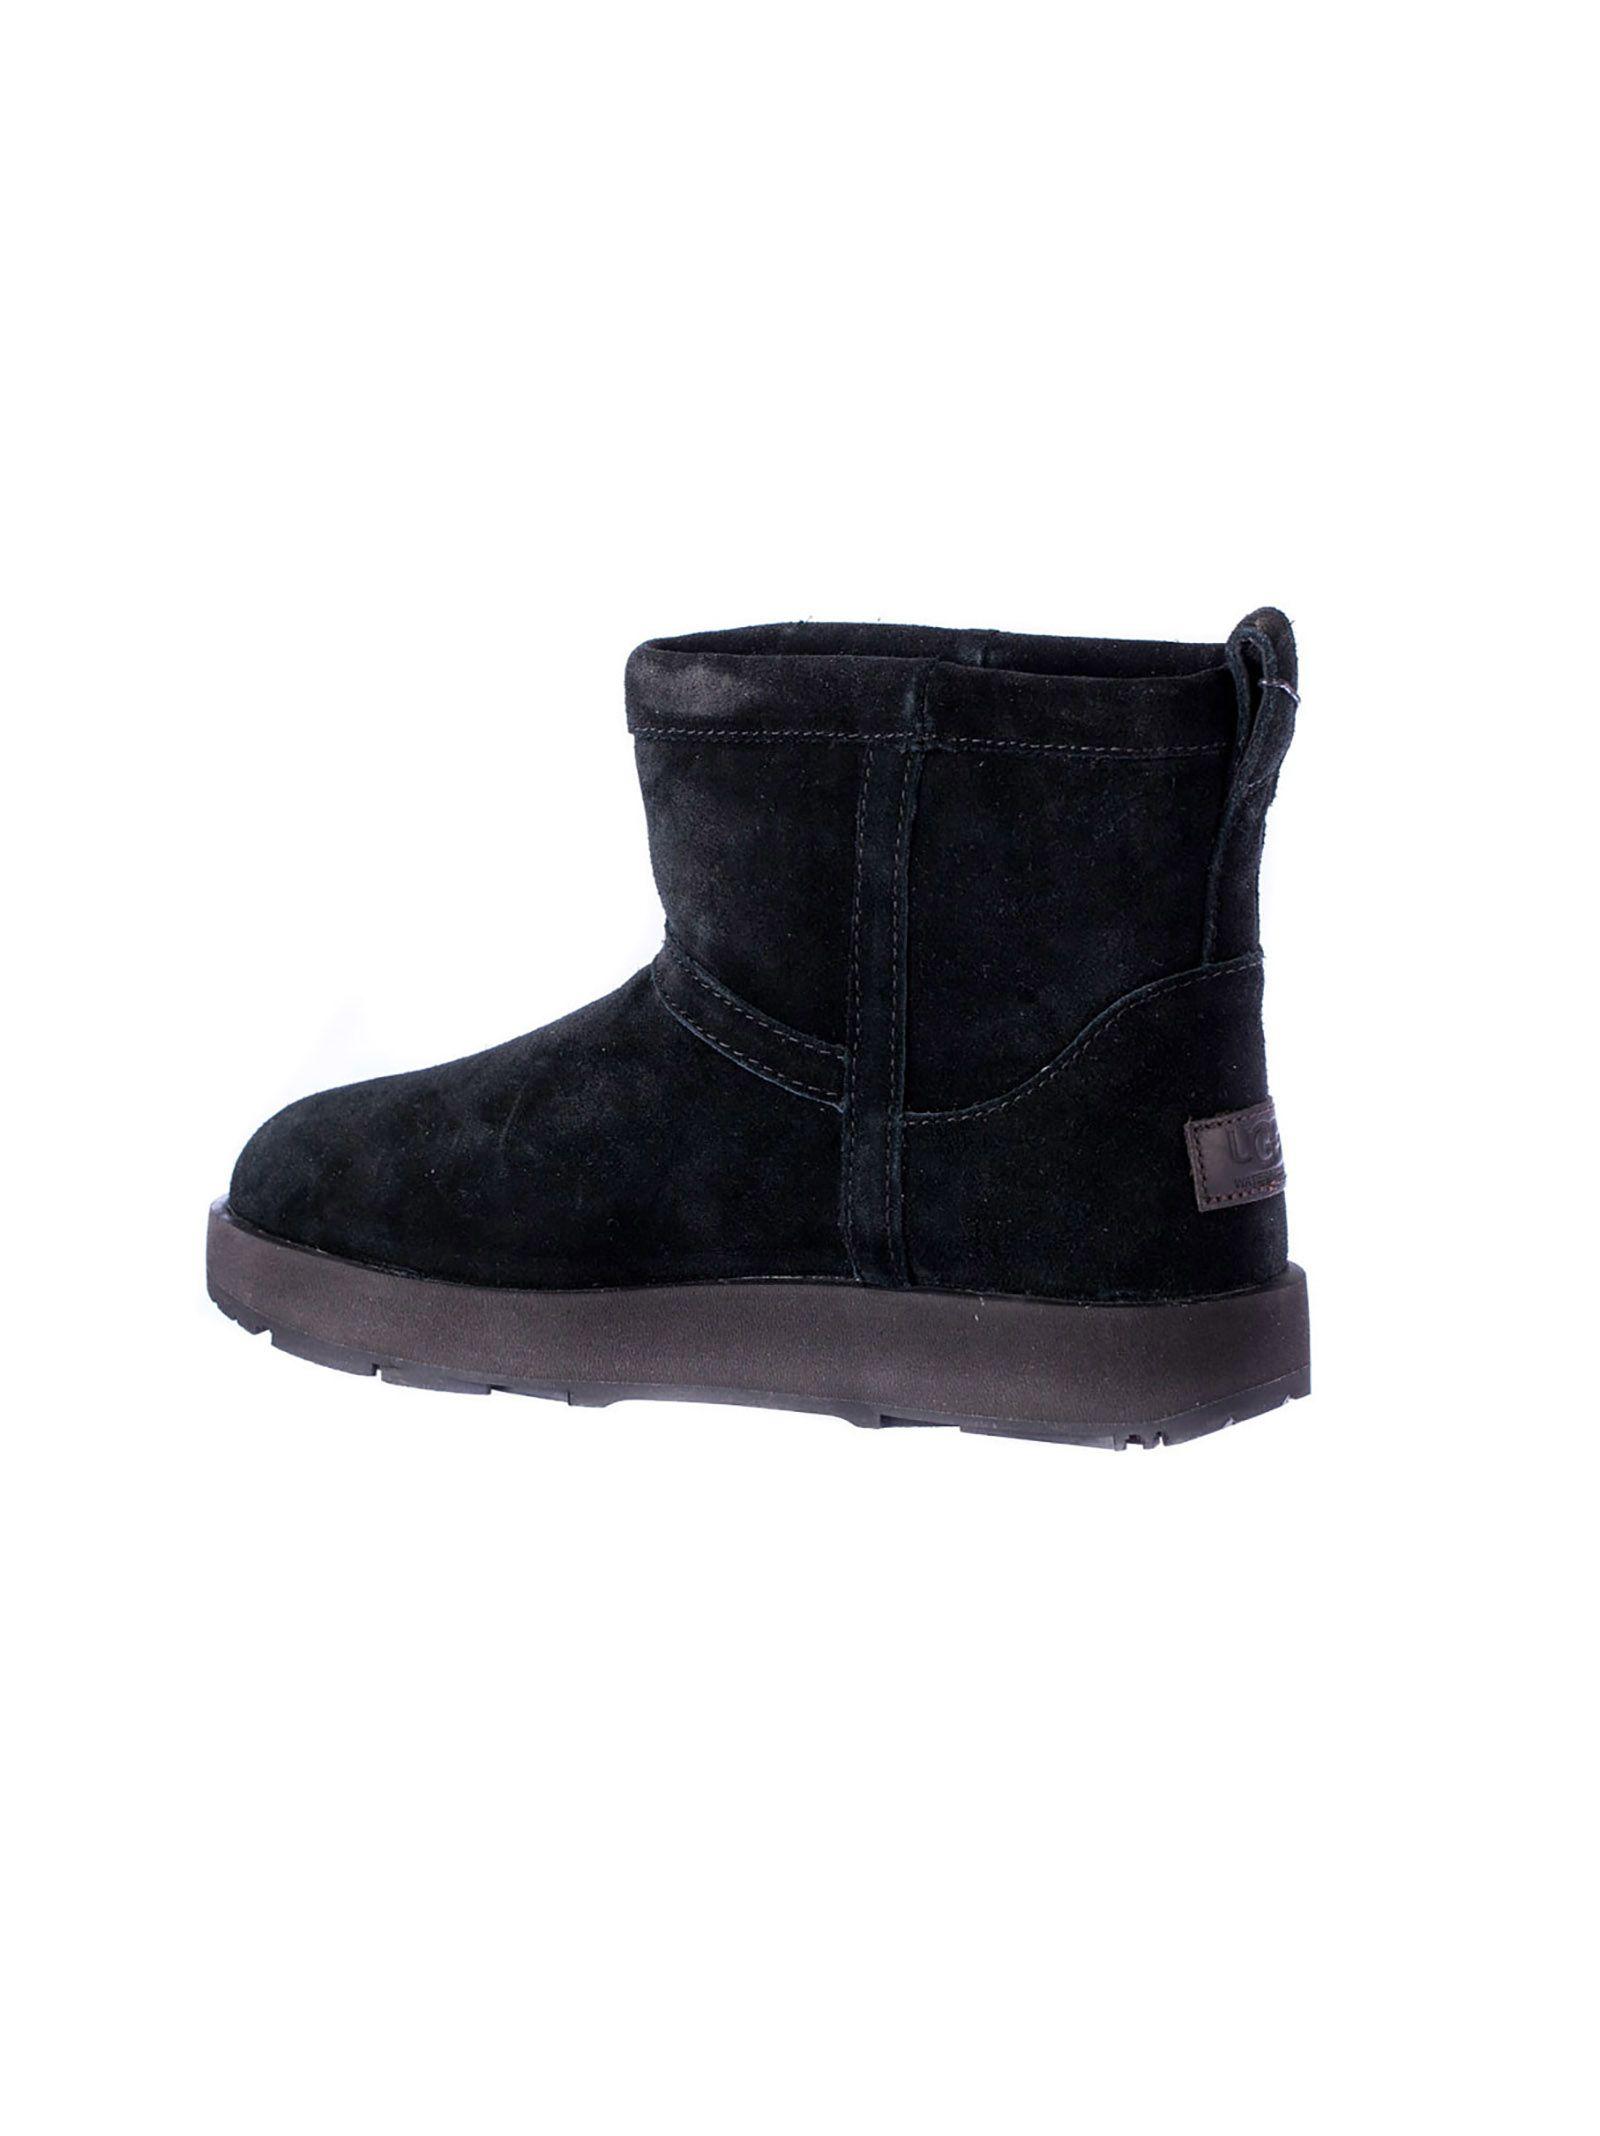 ... UGG Classic Mini Waterproof Boots - Black ...